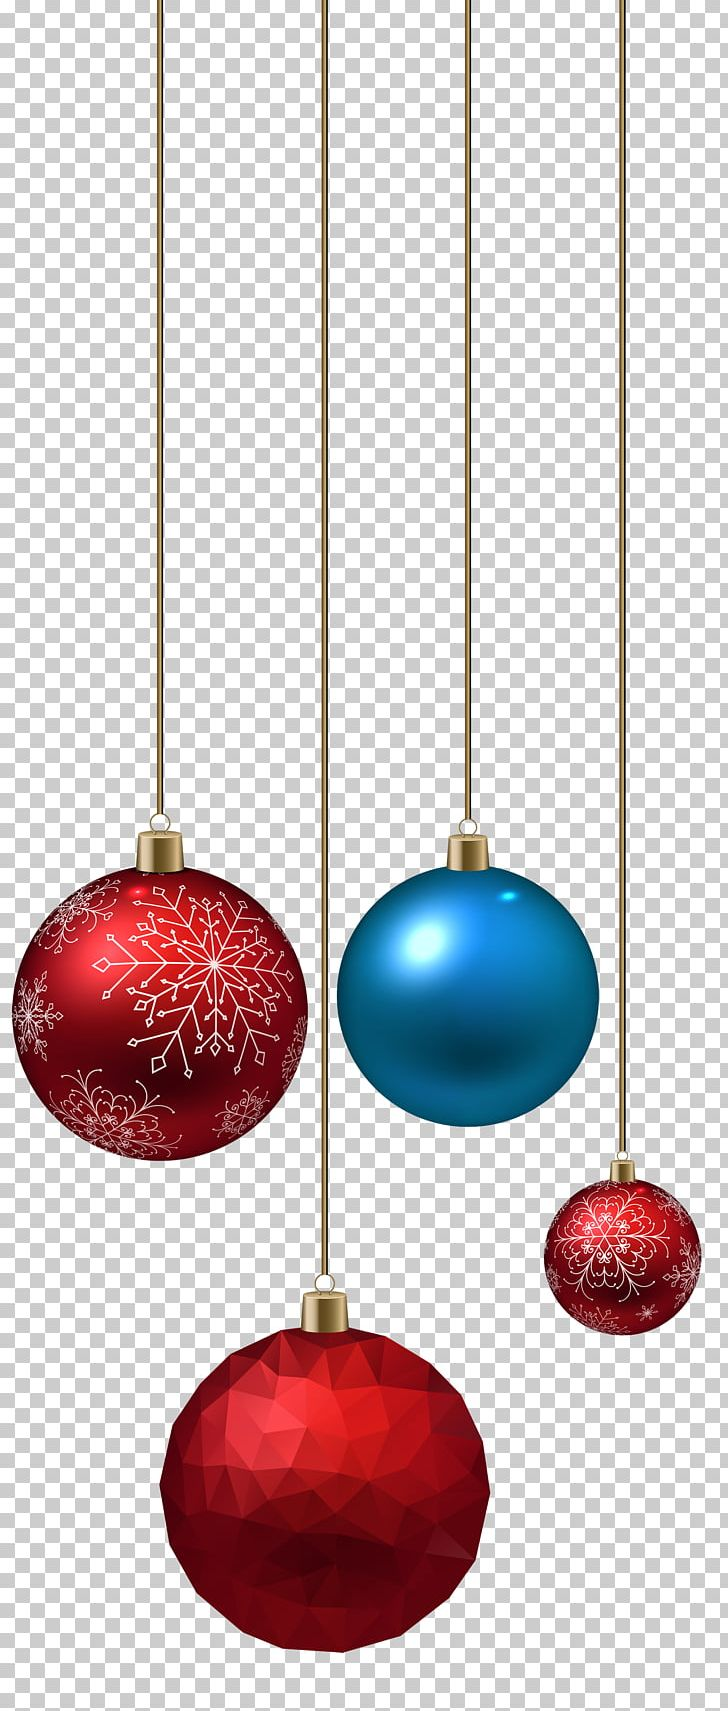 Santa Claus Christmas Ornament PNG, Clipart, Ball, Balls, Blue, Bowling Balls, Ceiling Fixture Free PNG Download